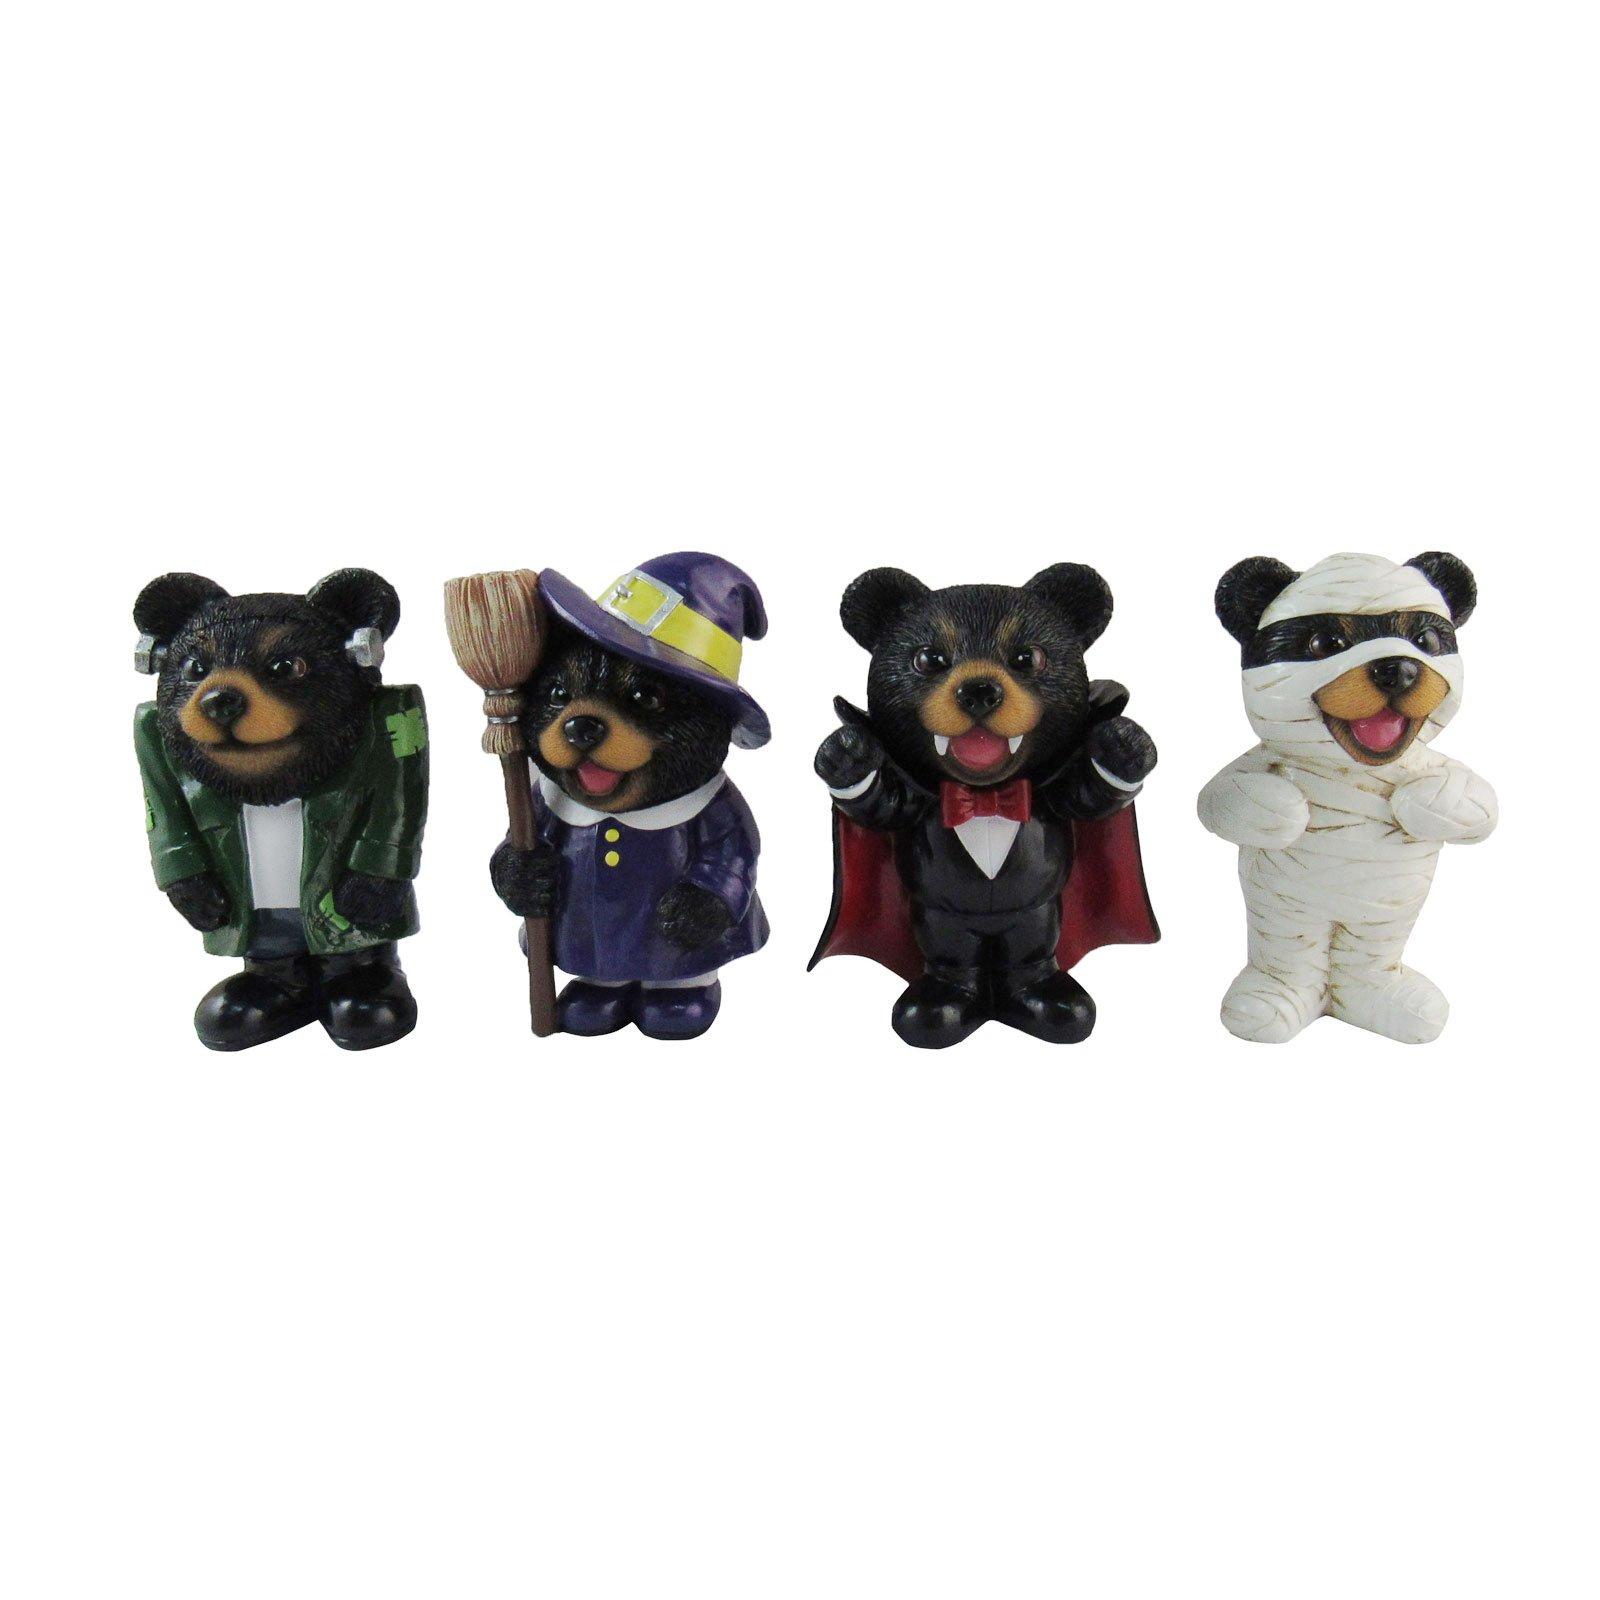 DWK Set of 4 Halloween Costume Bear Figurines